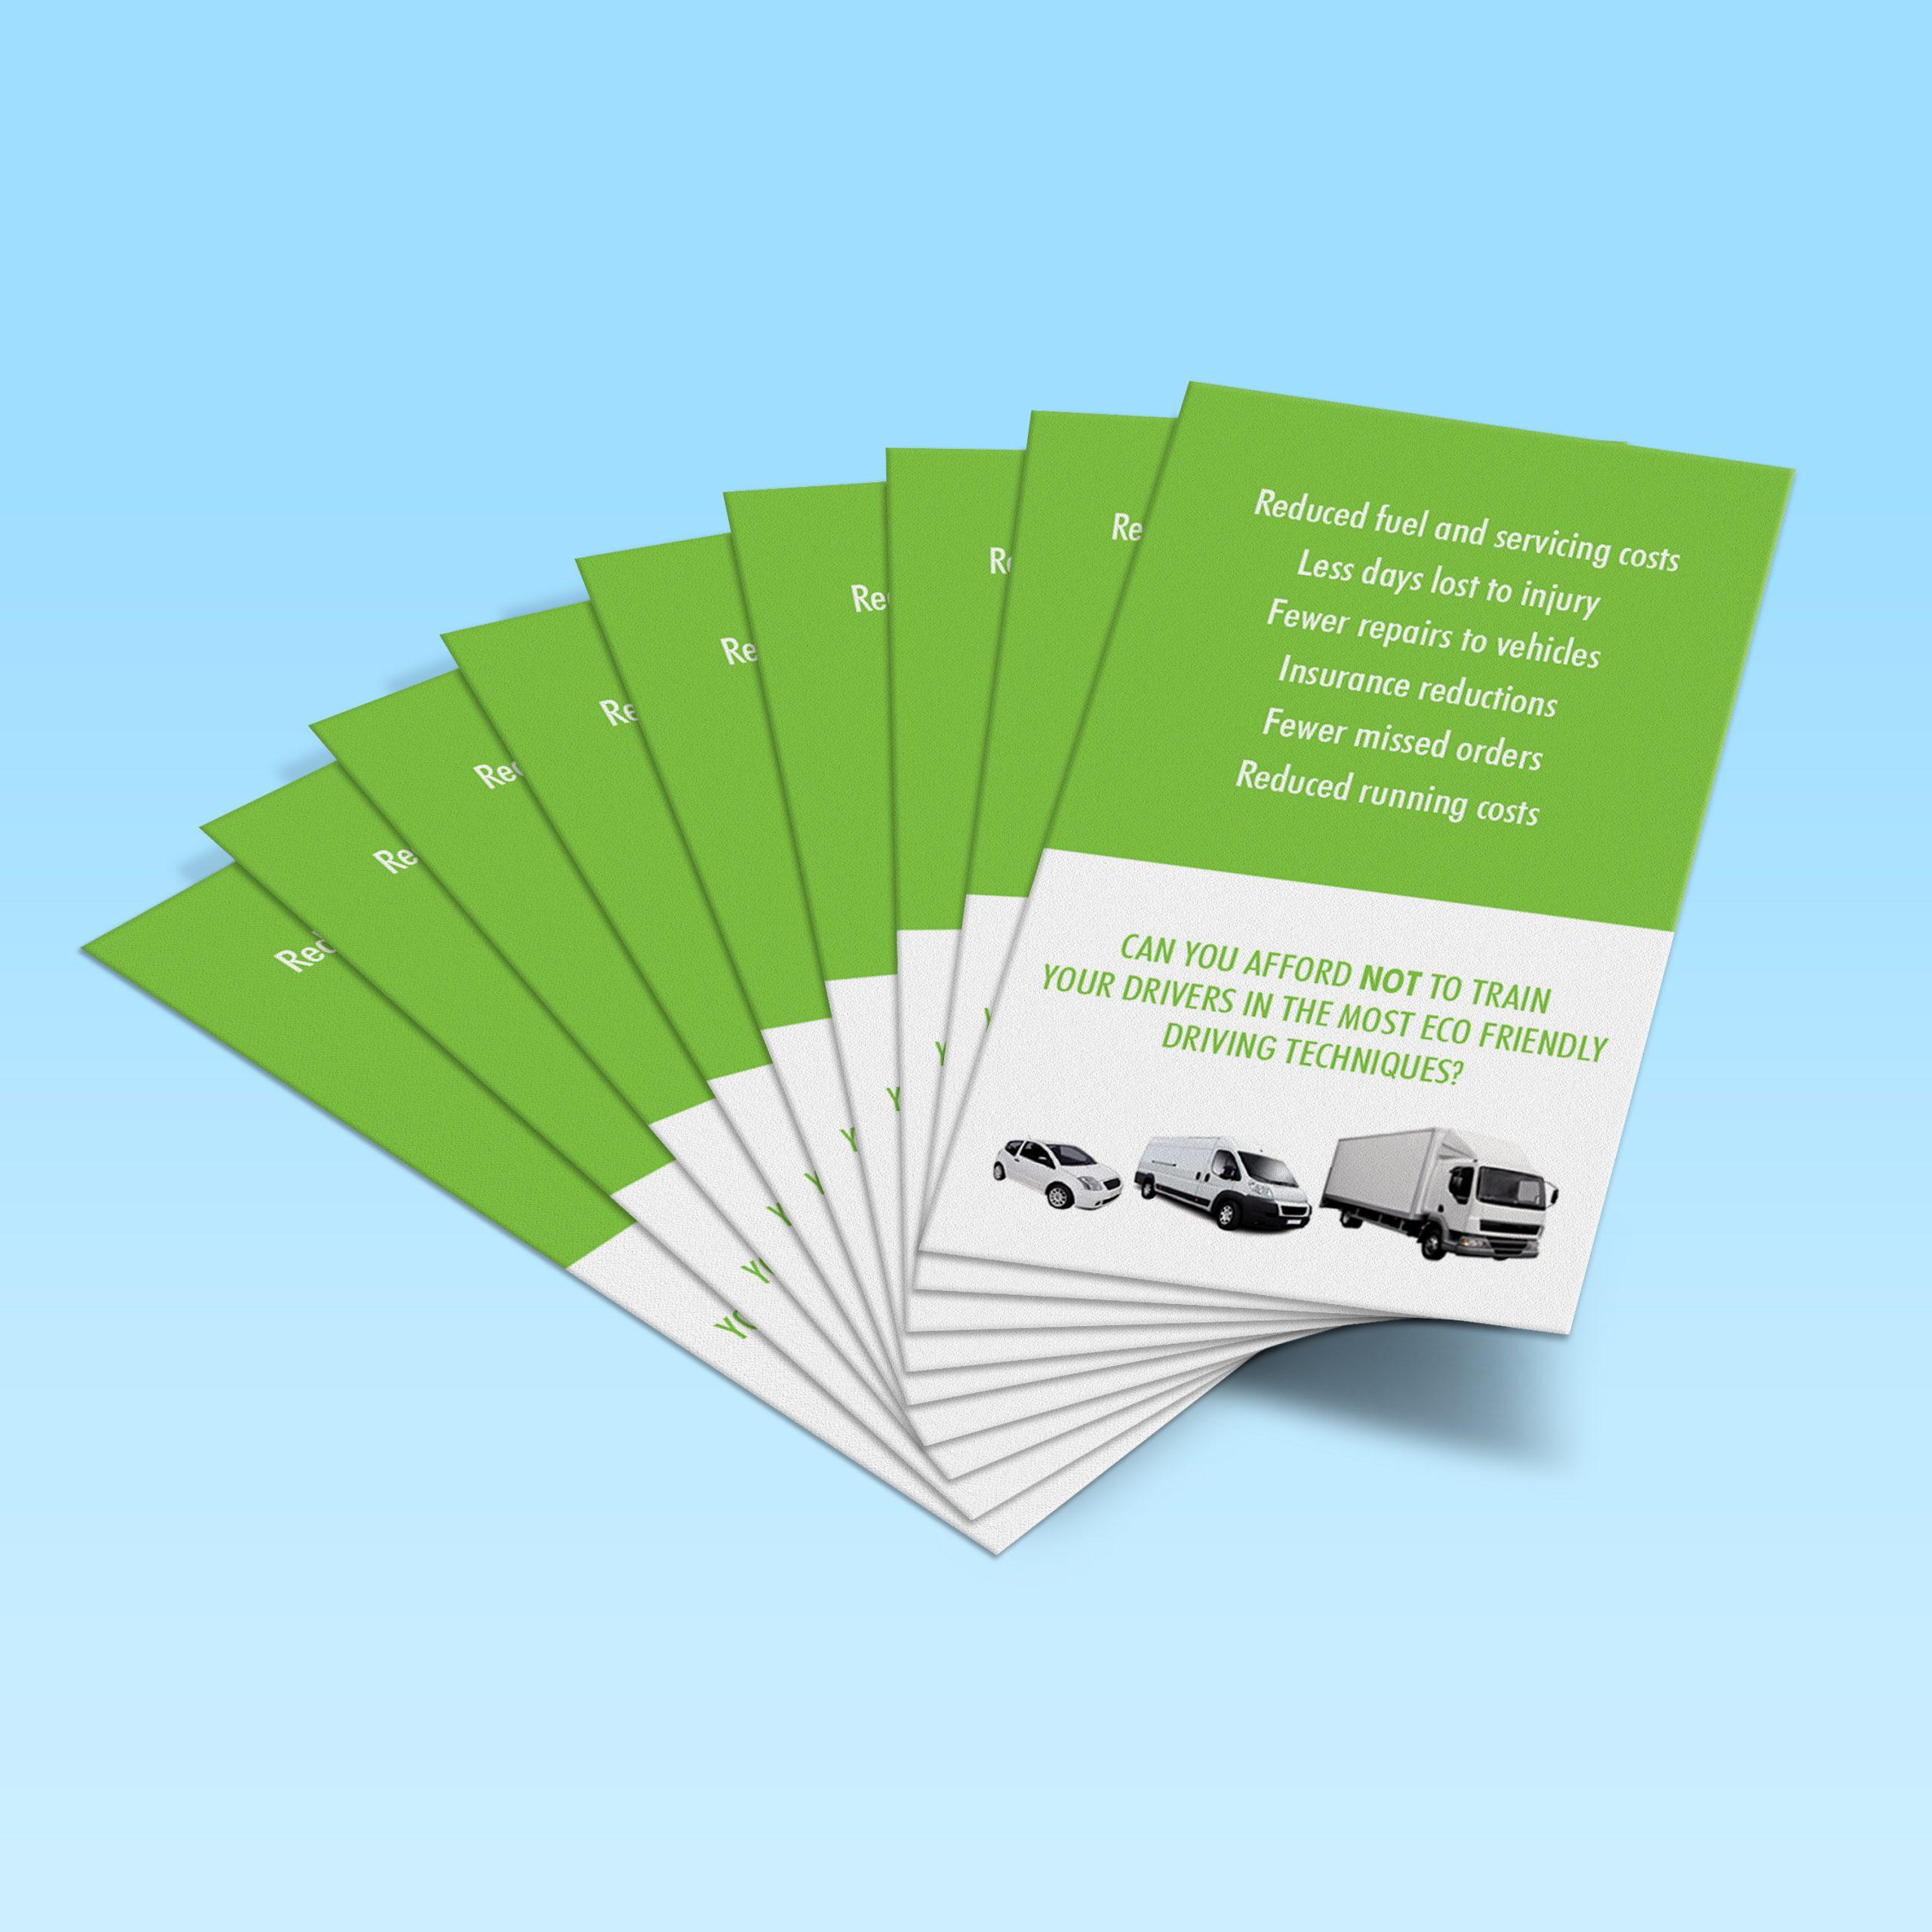 Branding for Priority Driver Training